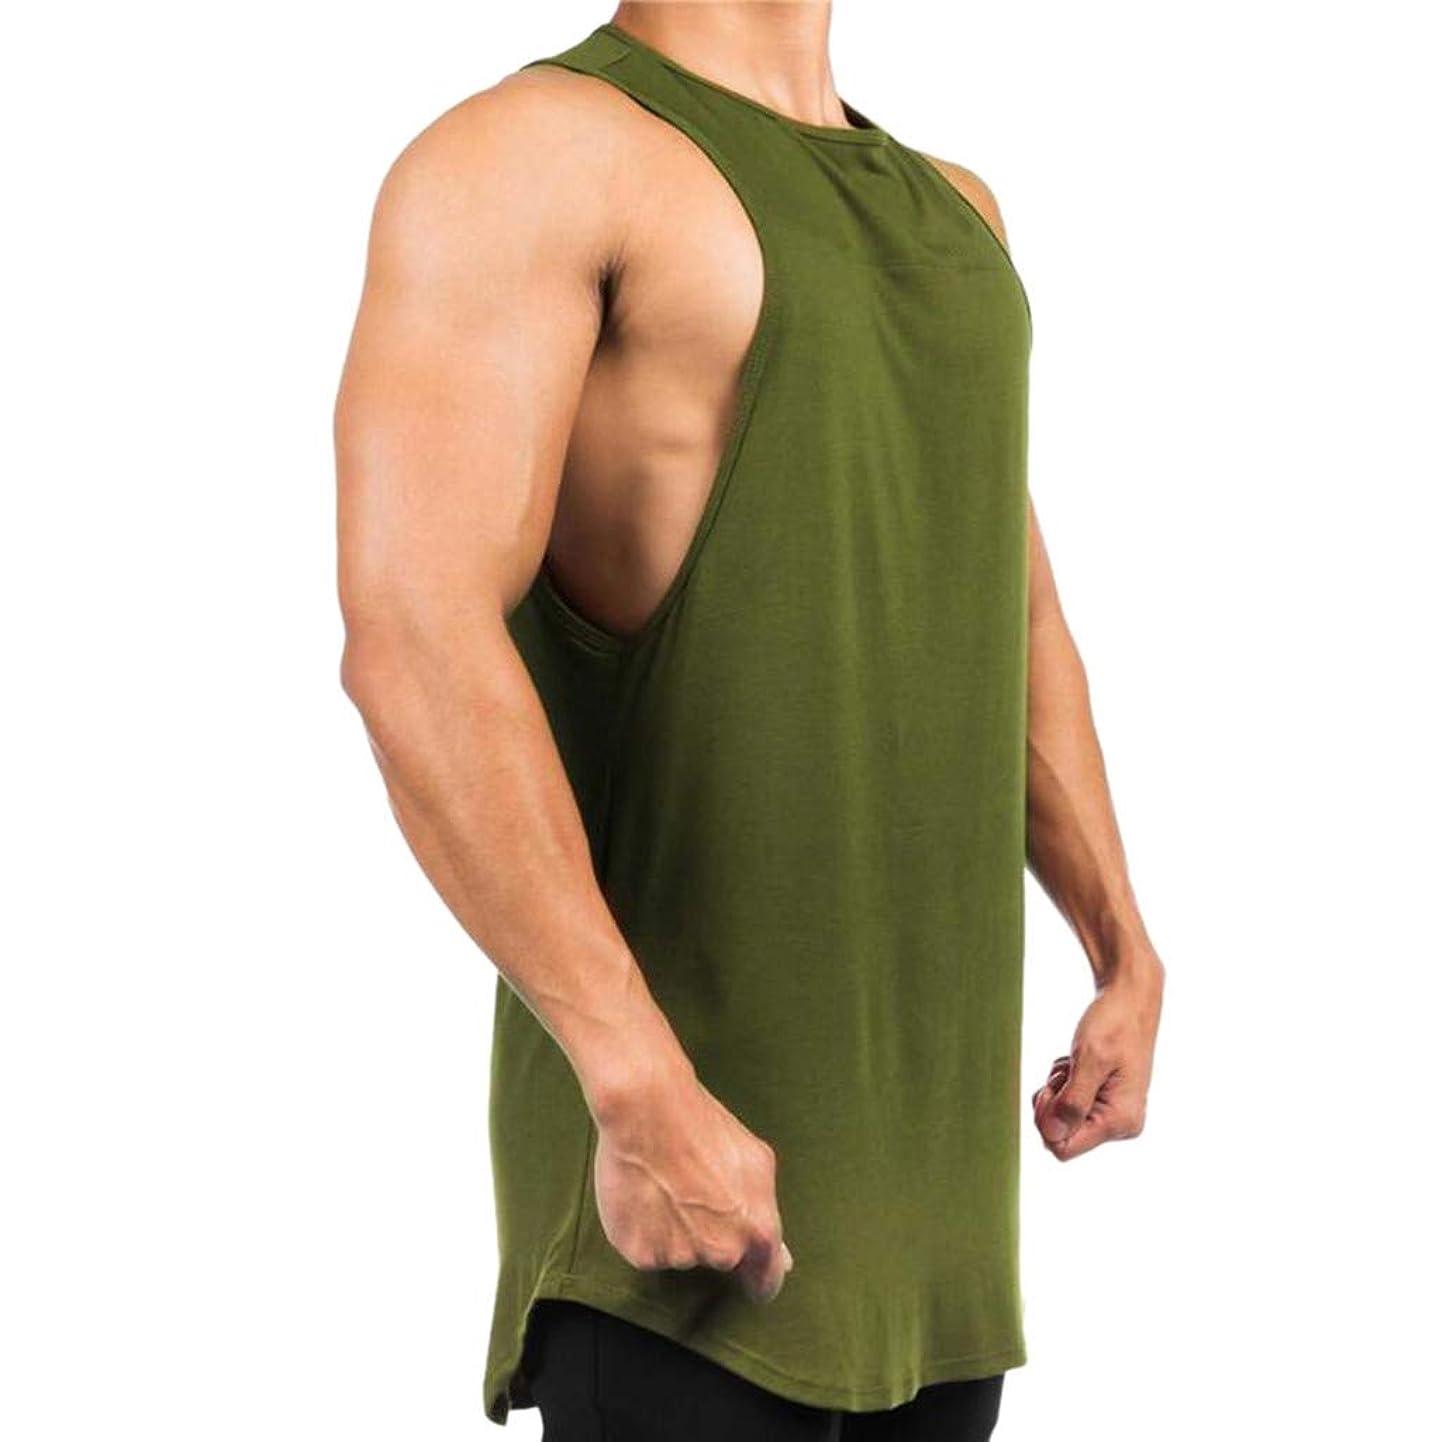 Hosamtel Men Tank Top T-Shirt Sleeveless Solid Casual Bodybuilding Sport Muscle Gym Workout Fitness Loose Fit Vest Tops lvhkxhdzgdj2